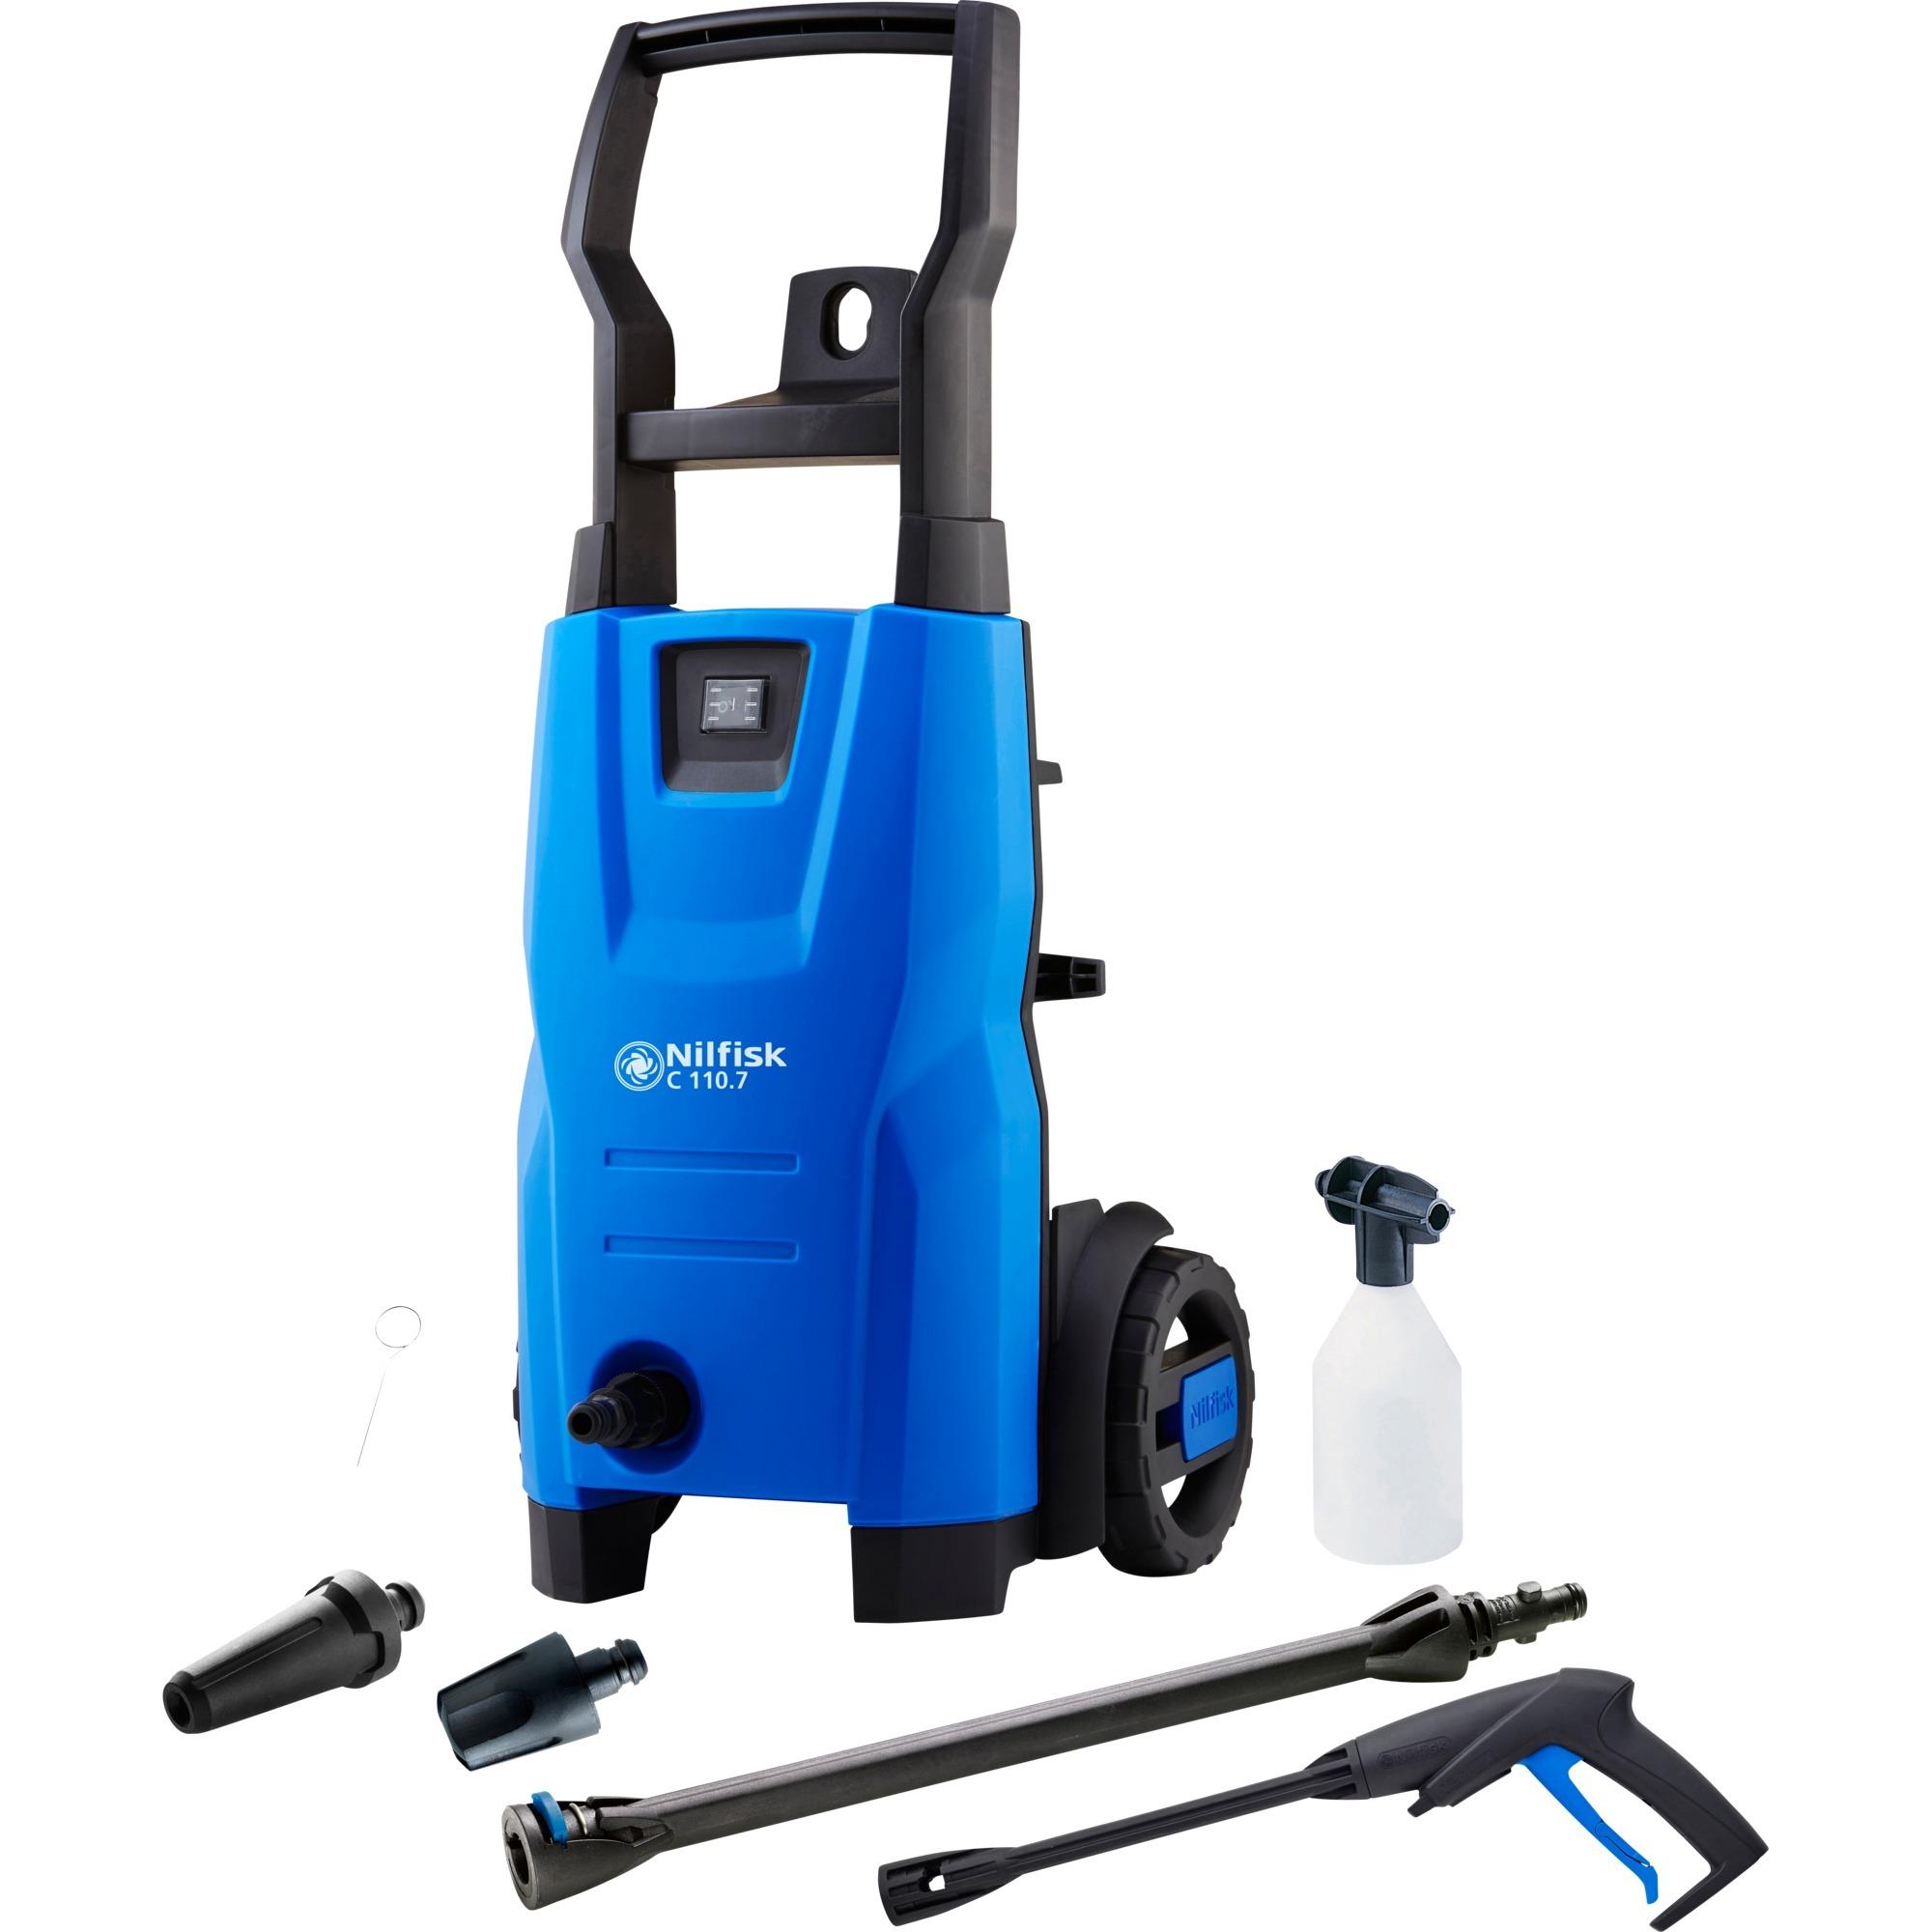 C 110.7-5 X-TRA EU Vertical Eléctrico 440l/h 1400W Negro, Azul Limpiadora de alta presión o Hidrolimpiadora, Hidrolimpiadora de alta presión